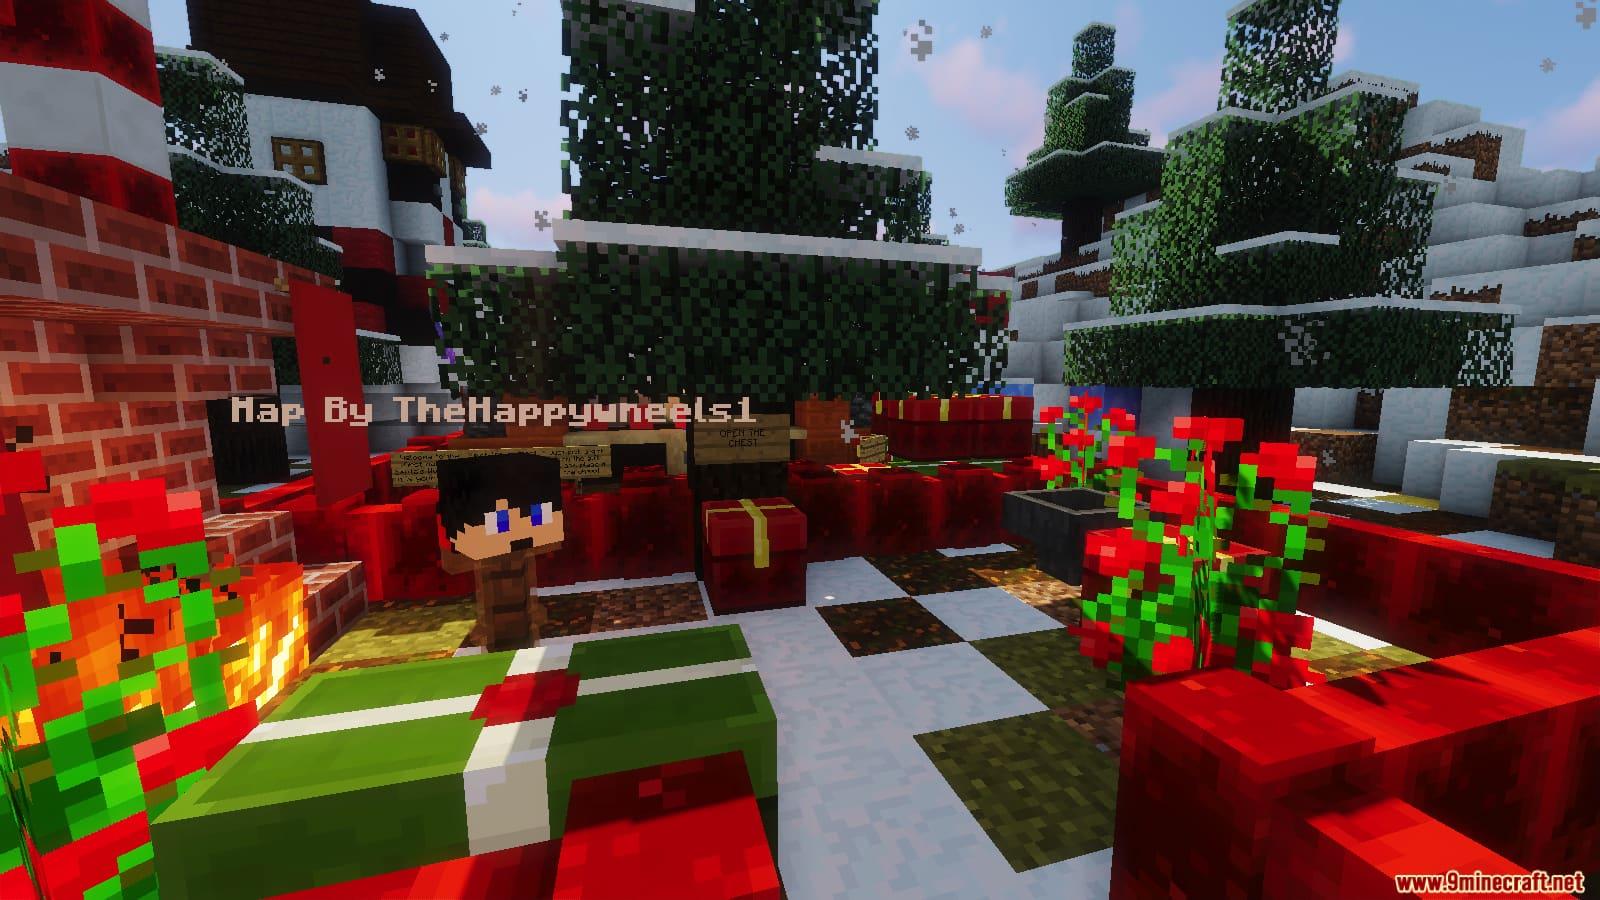 Minecraft Christmas Map.Unfair Christmas Map 1 13 2 For Minecraft 9minecraft Net